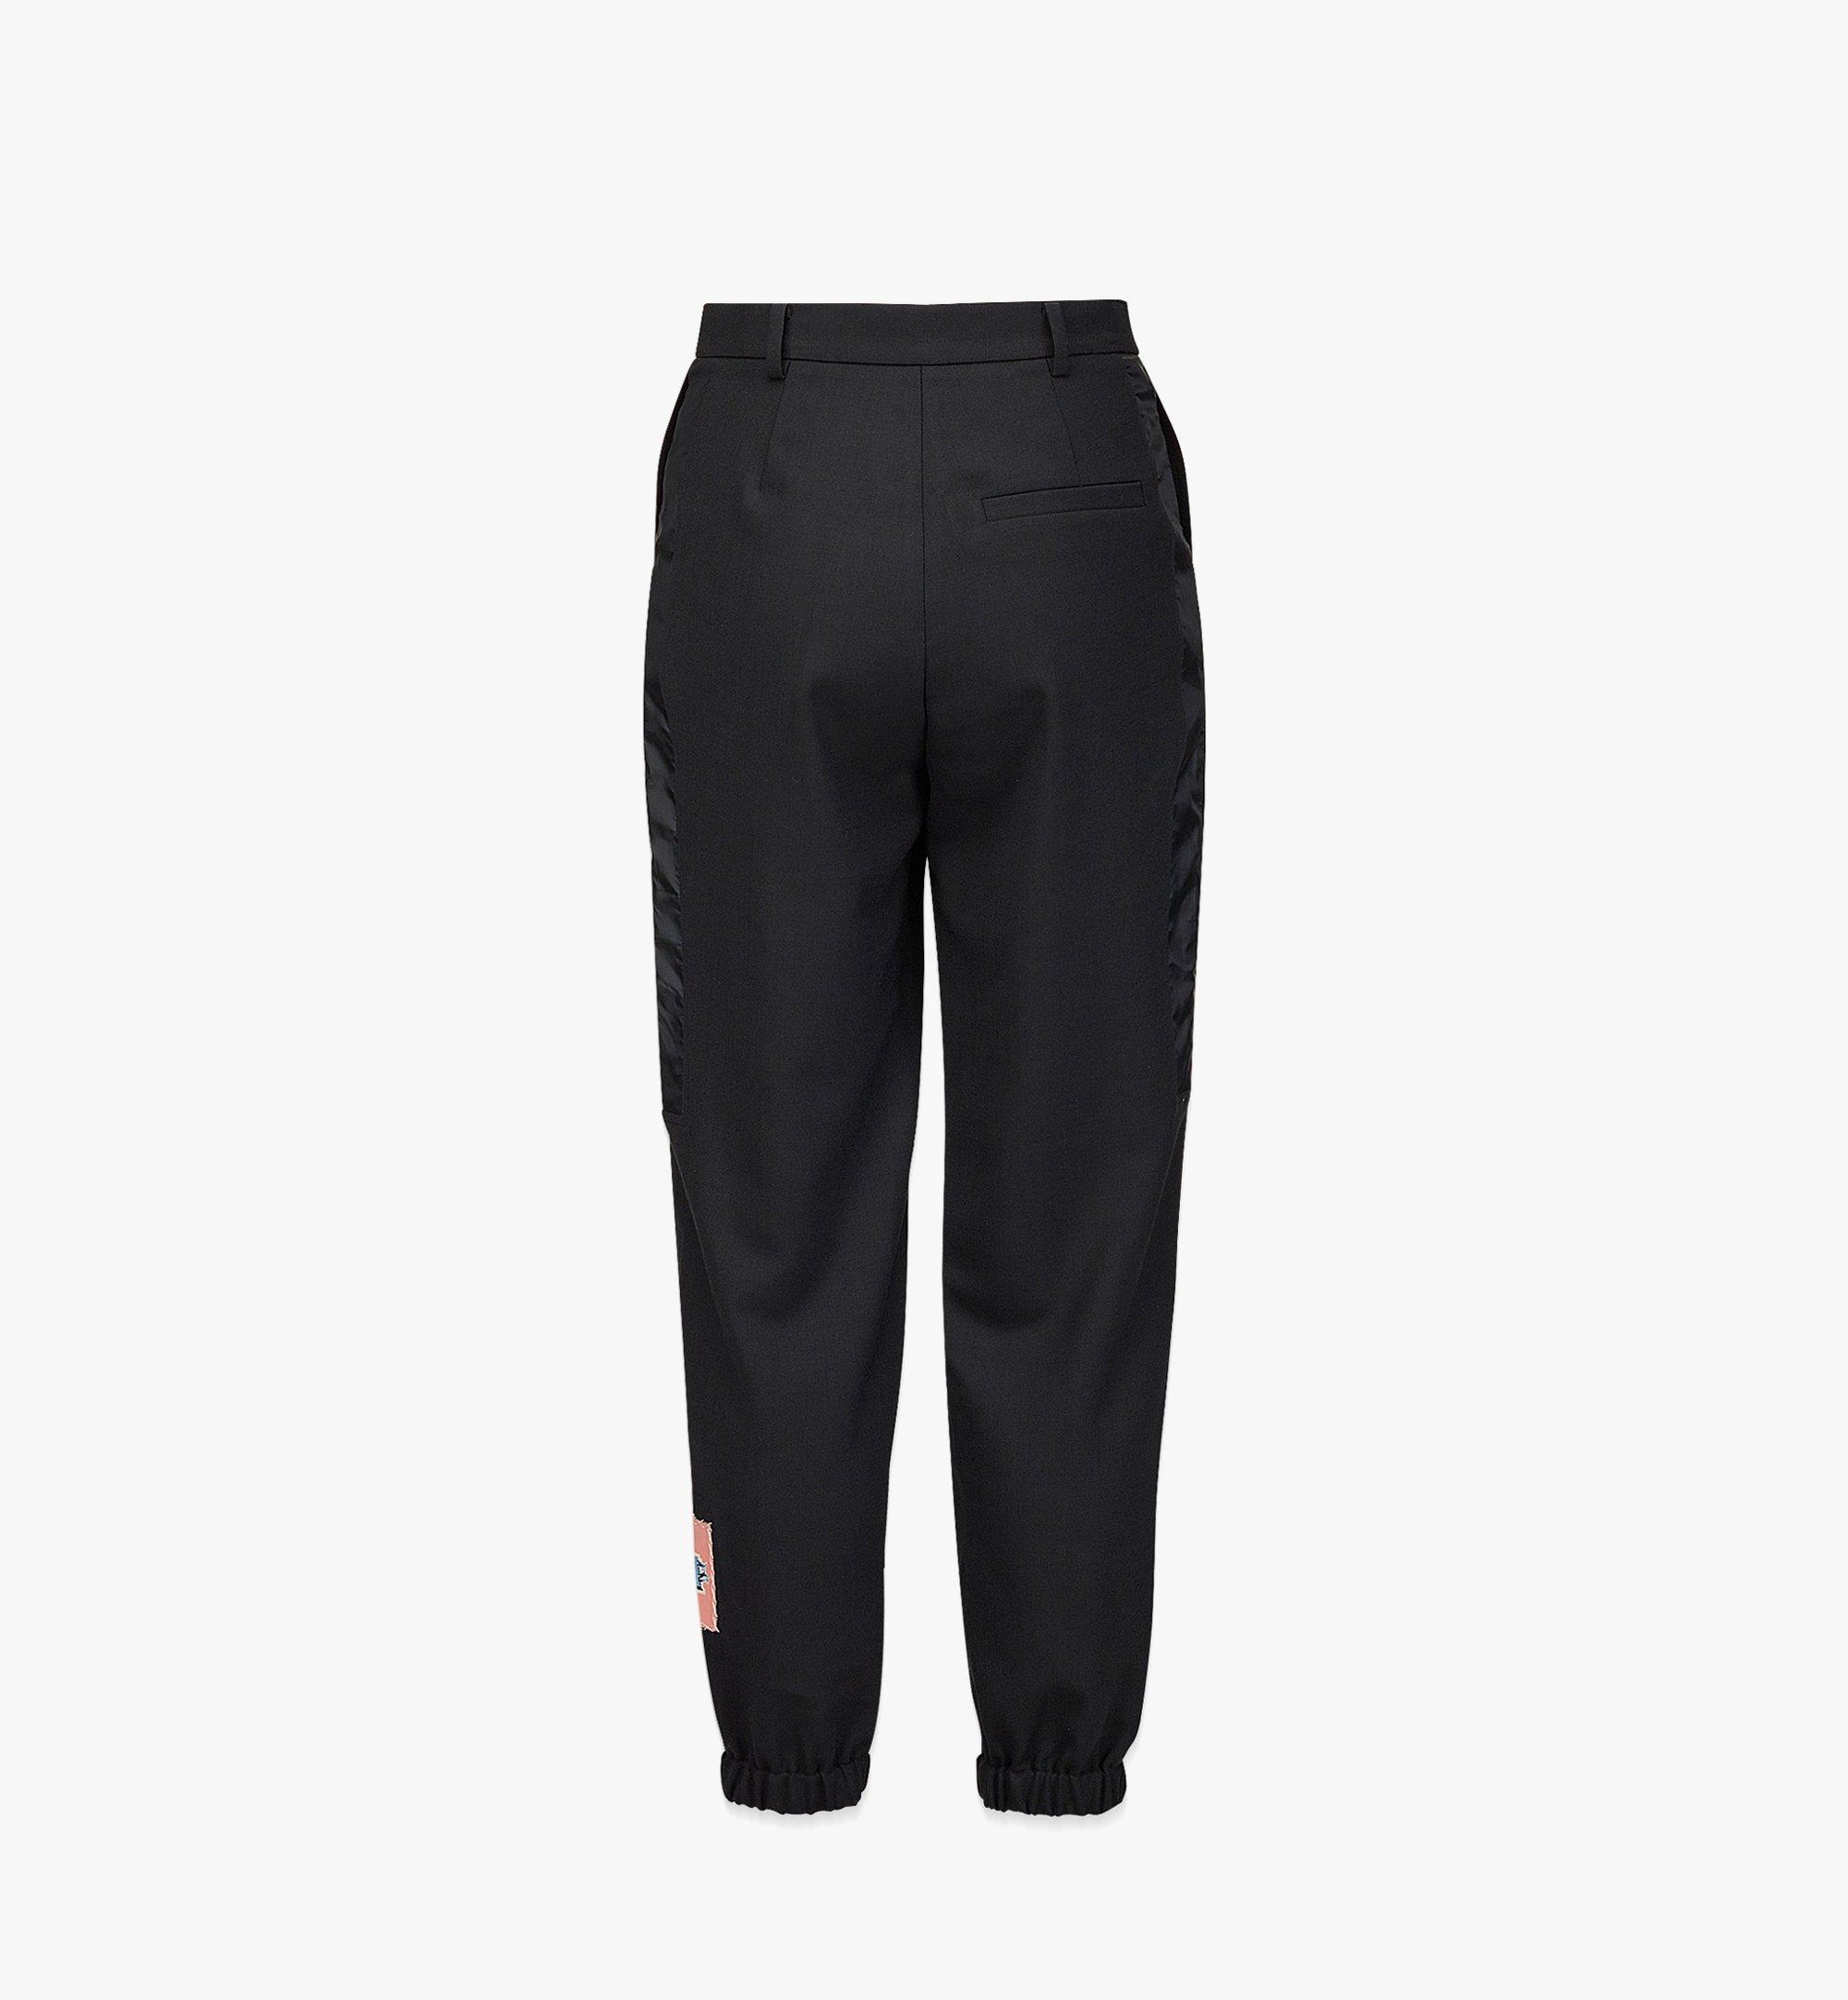 MCM Women's Wool Jogging Pants Black MFPBAMM02BK040 Alternate View 1